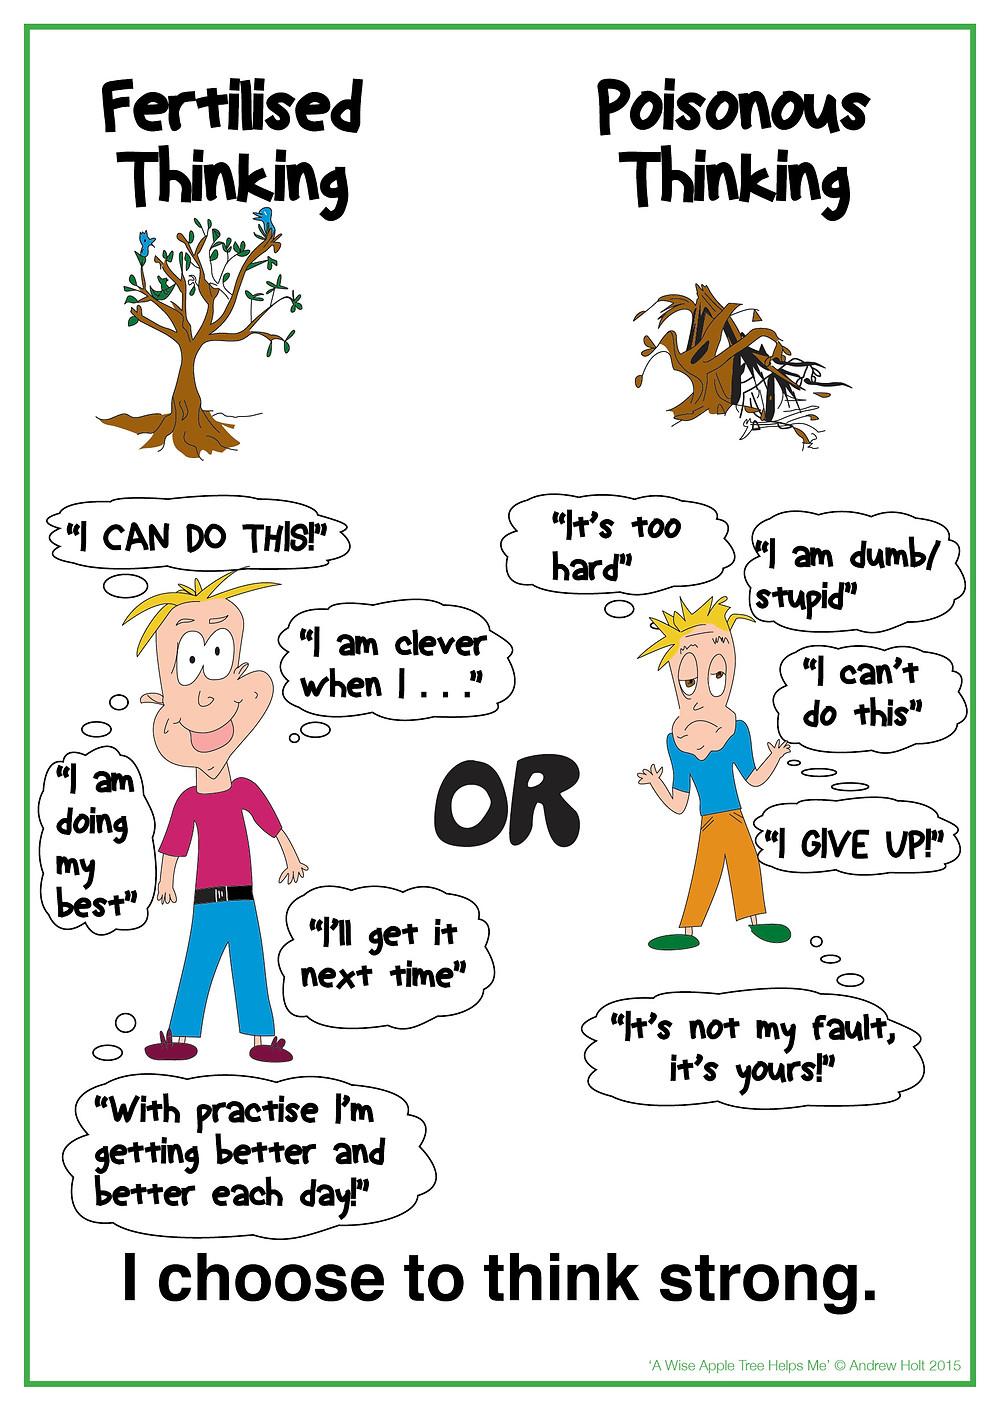 Self- Talk - Fertiliser and Poison Thinking